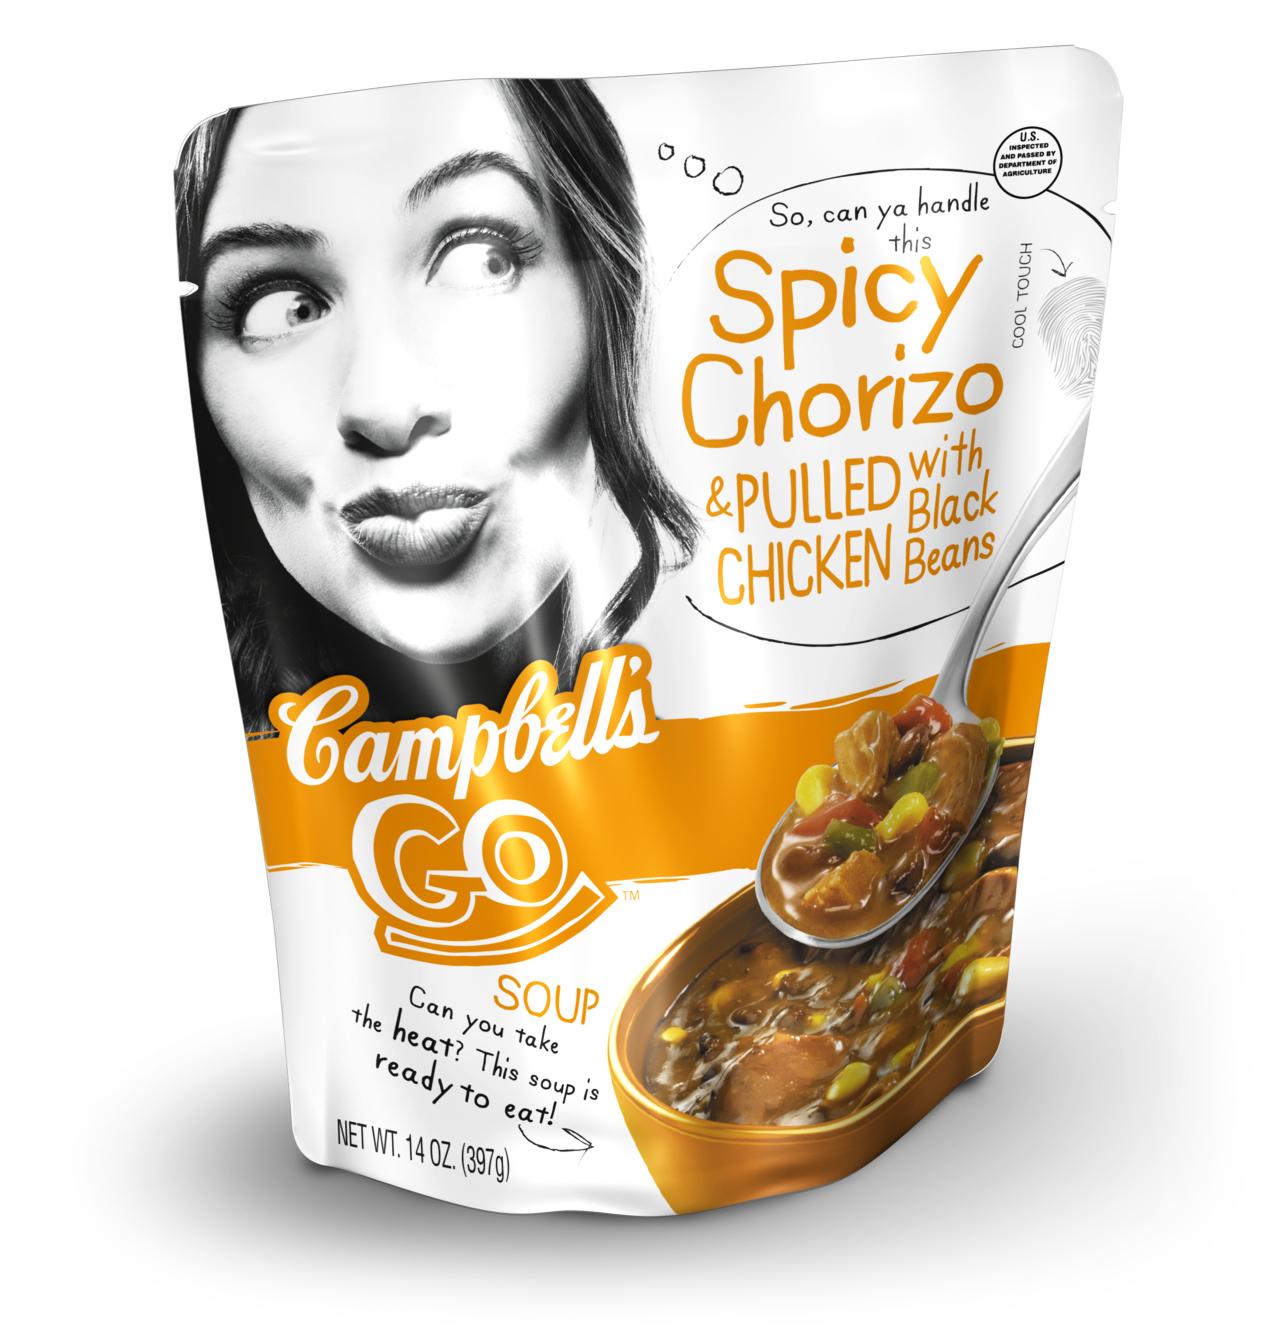 Campbells Go Soup Print image Creativity Online